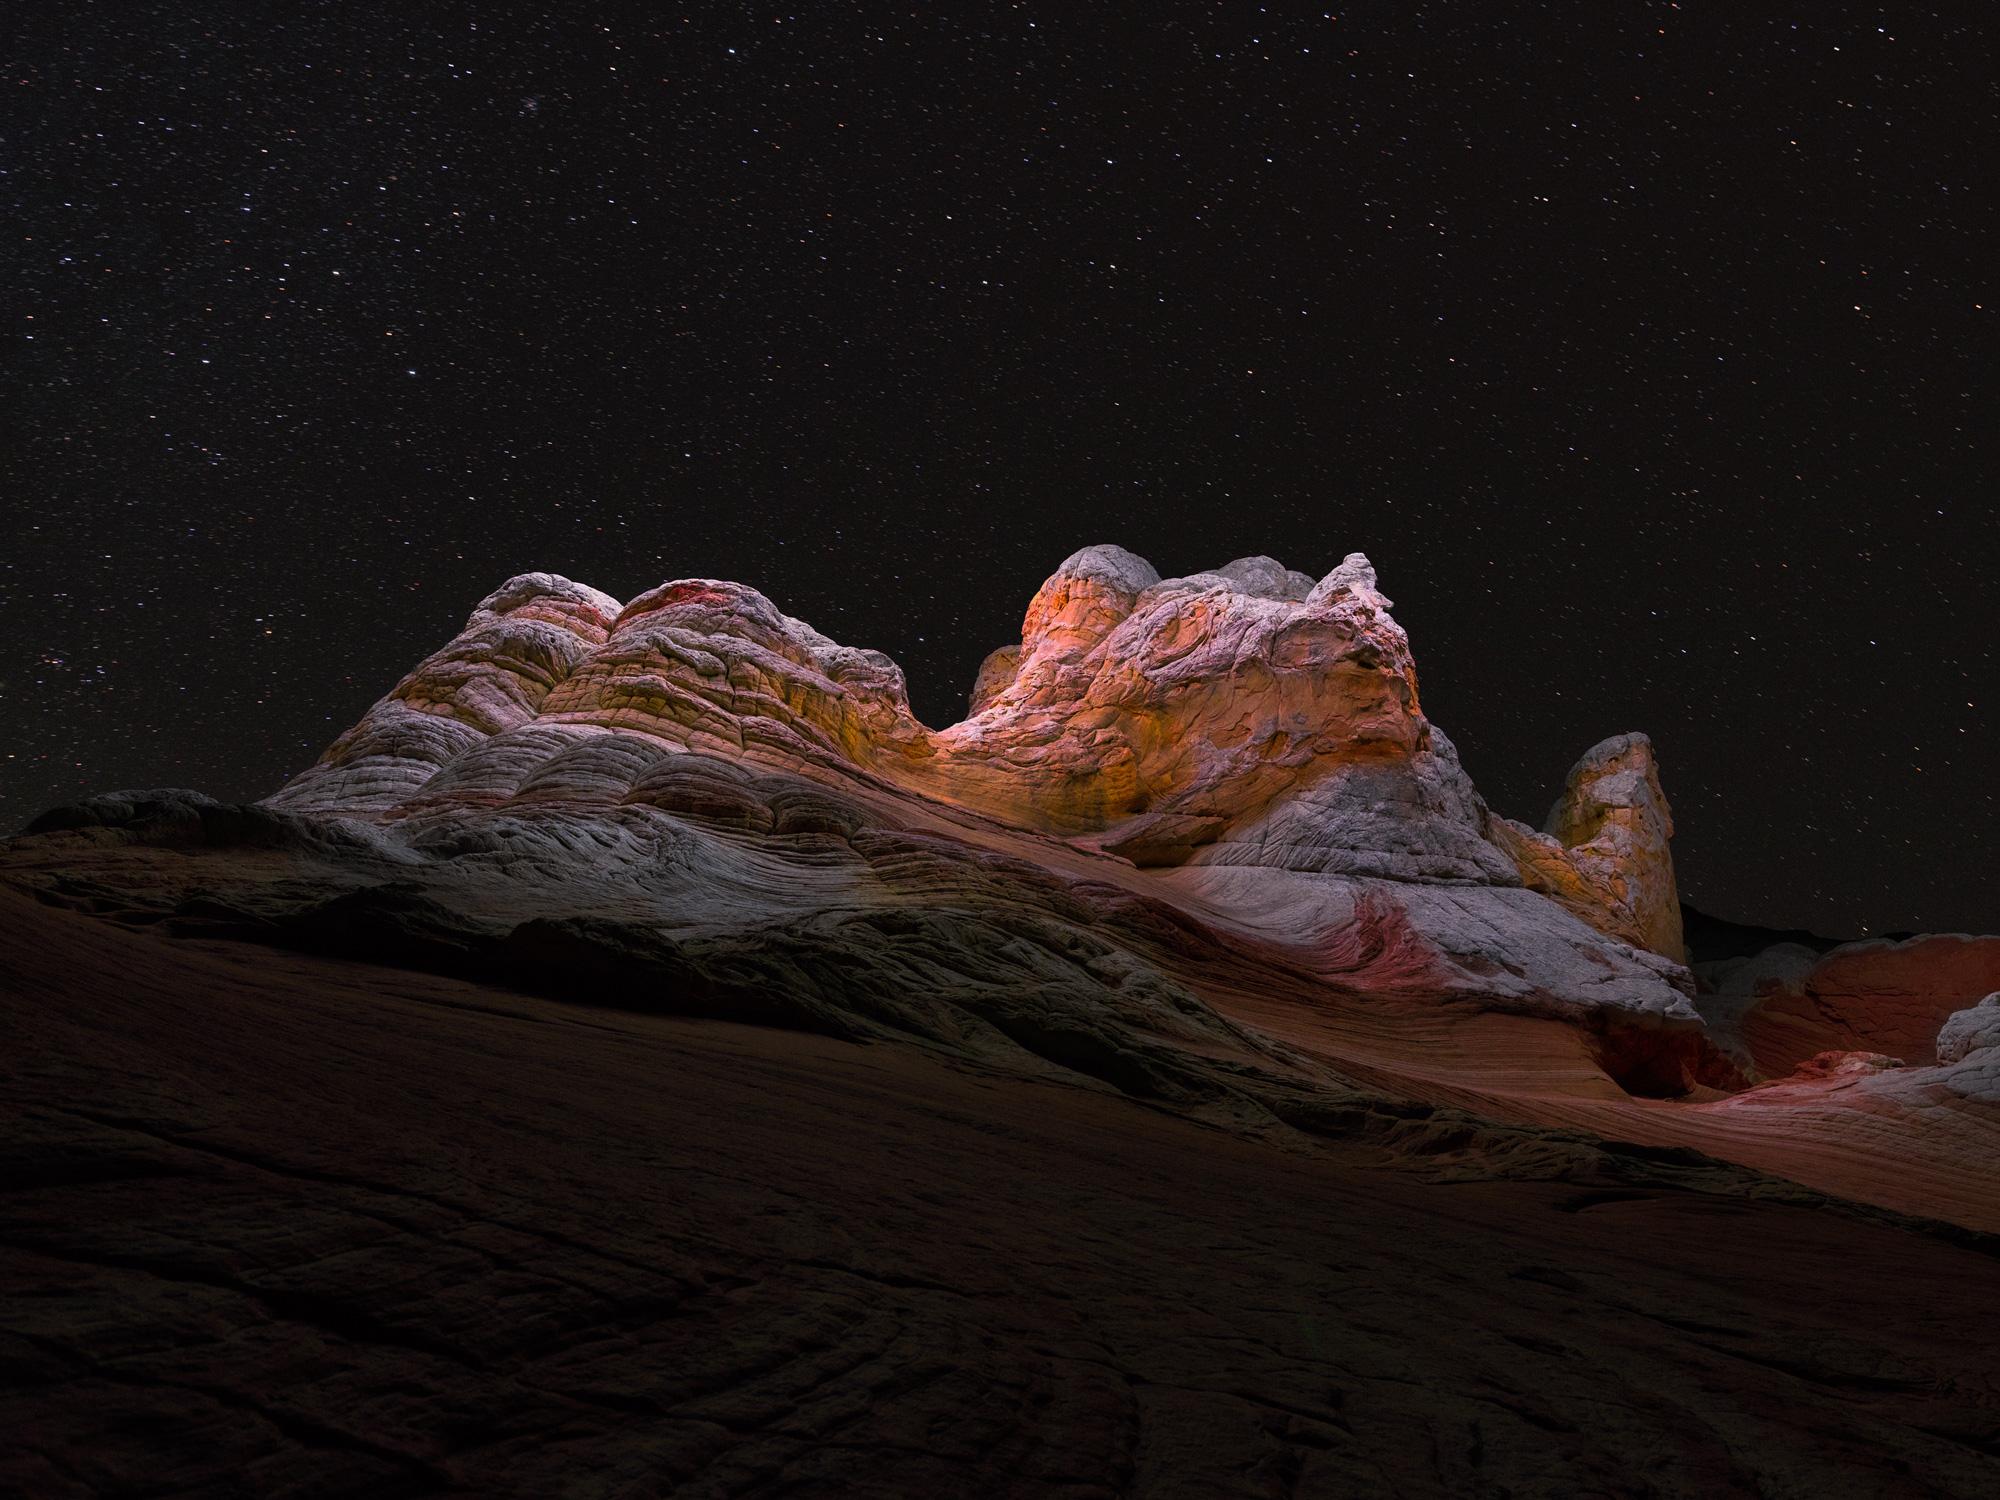 Long Exposure Photos Capture the Light Paths of Drones Above Mountainous Landscapes